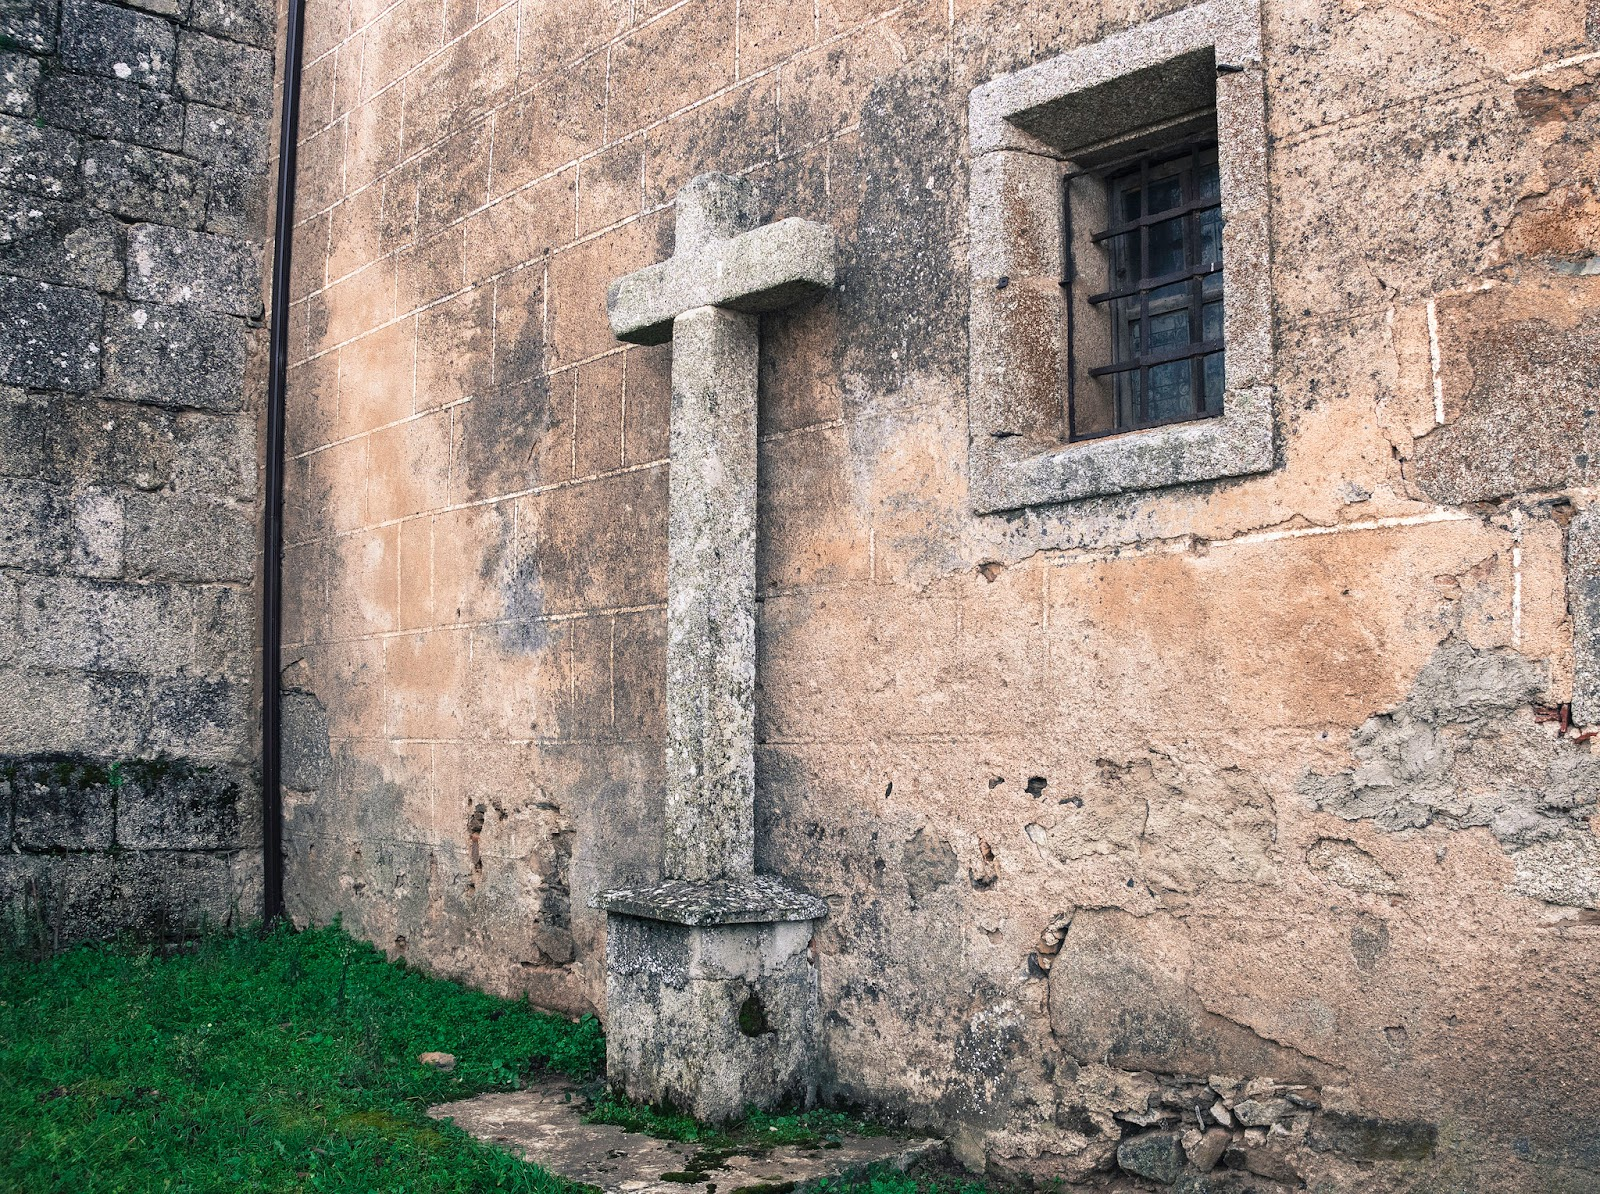 Fachada Iglesia de Ciudad Rodrigo, Salamanca, 2015